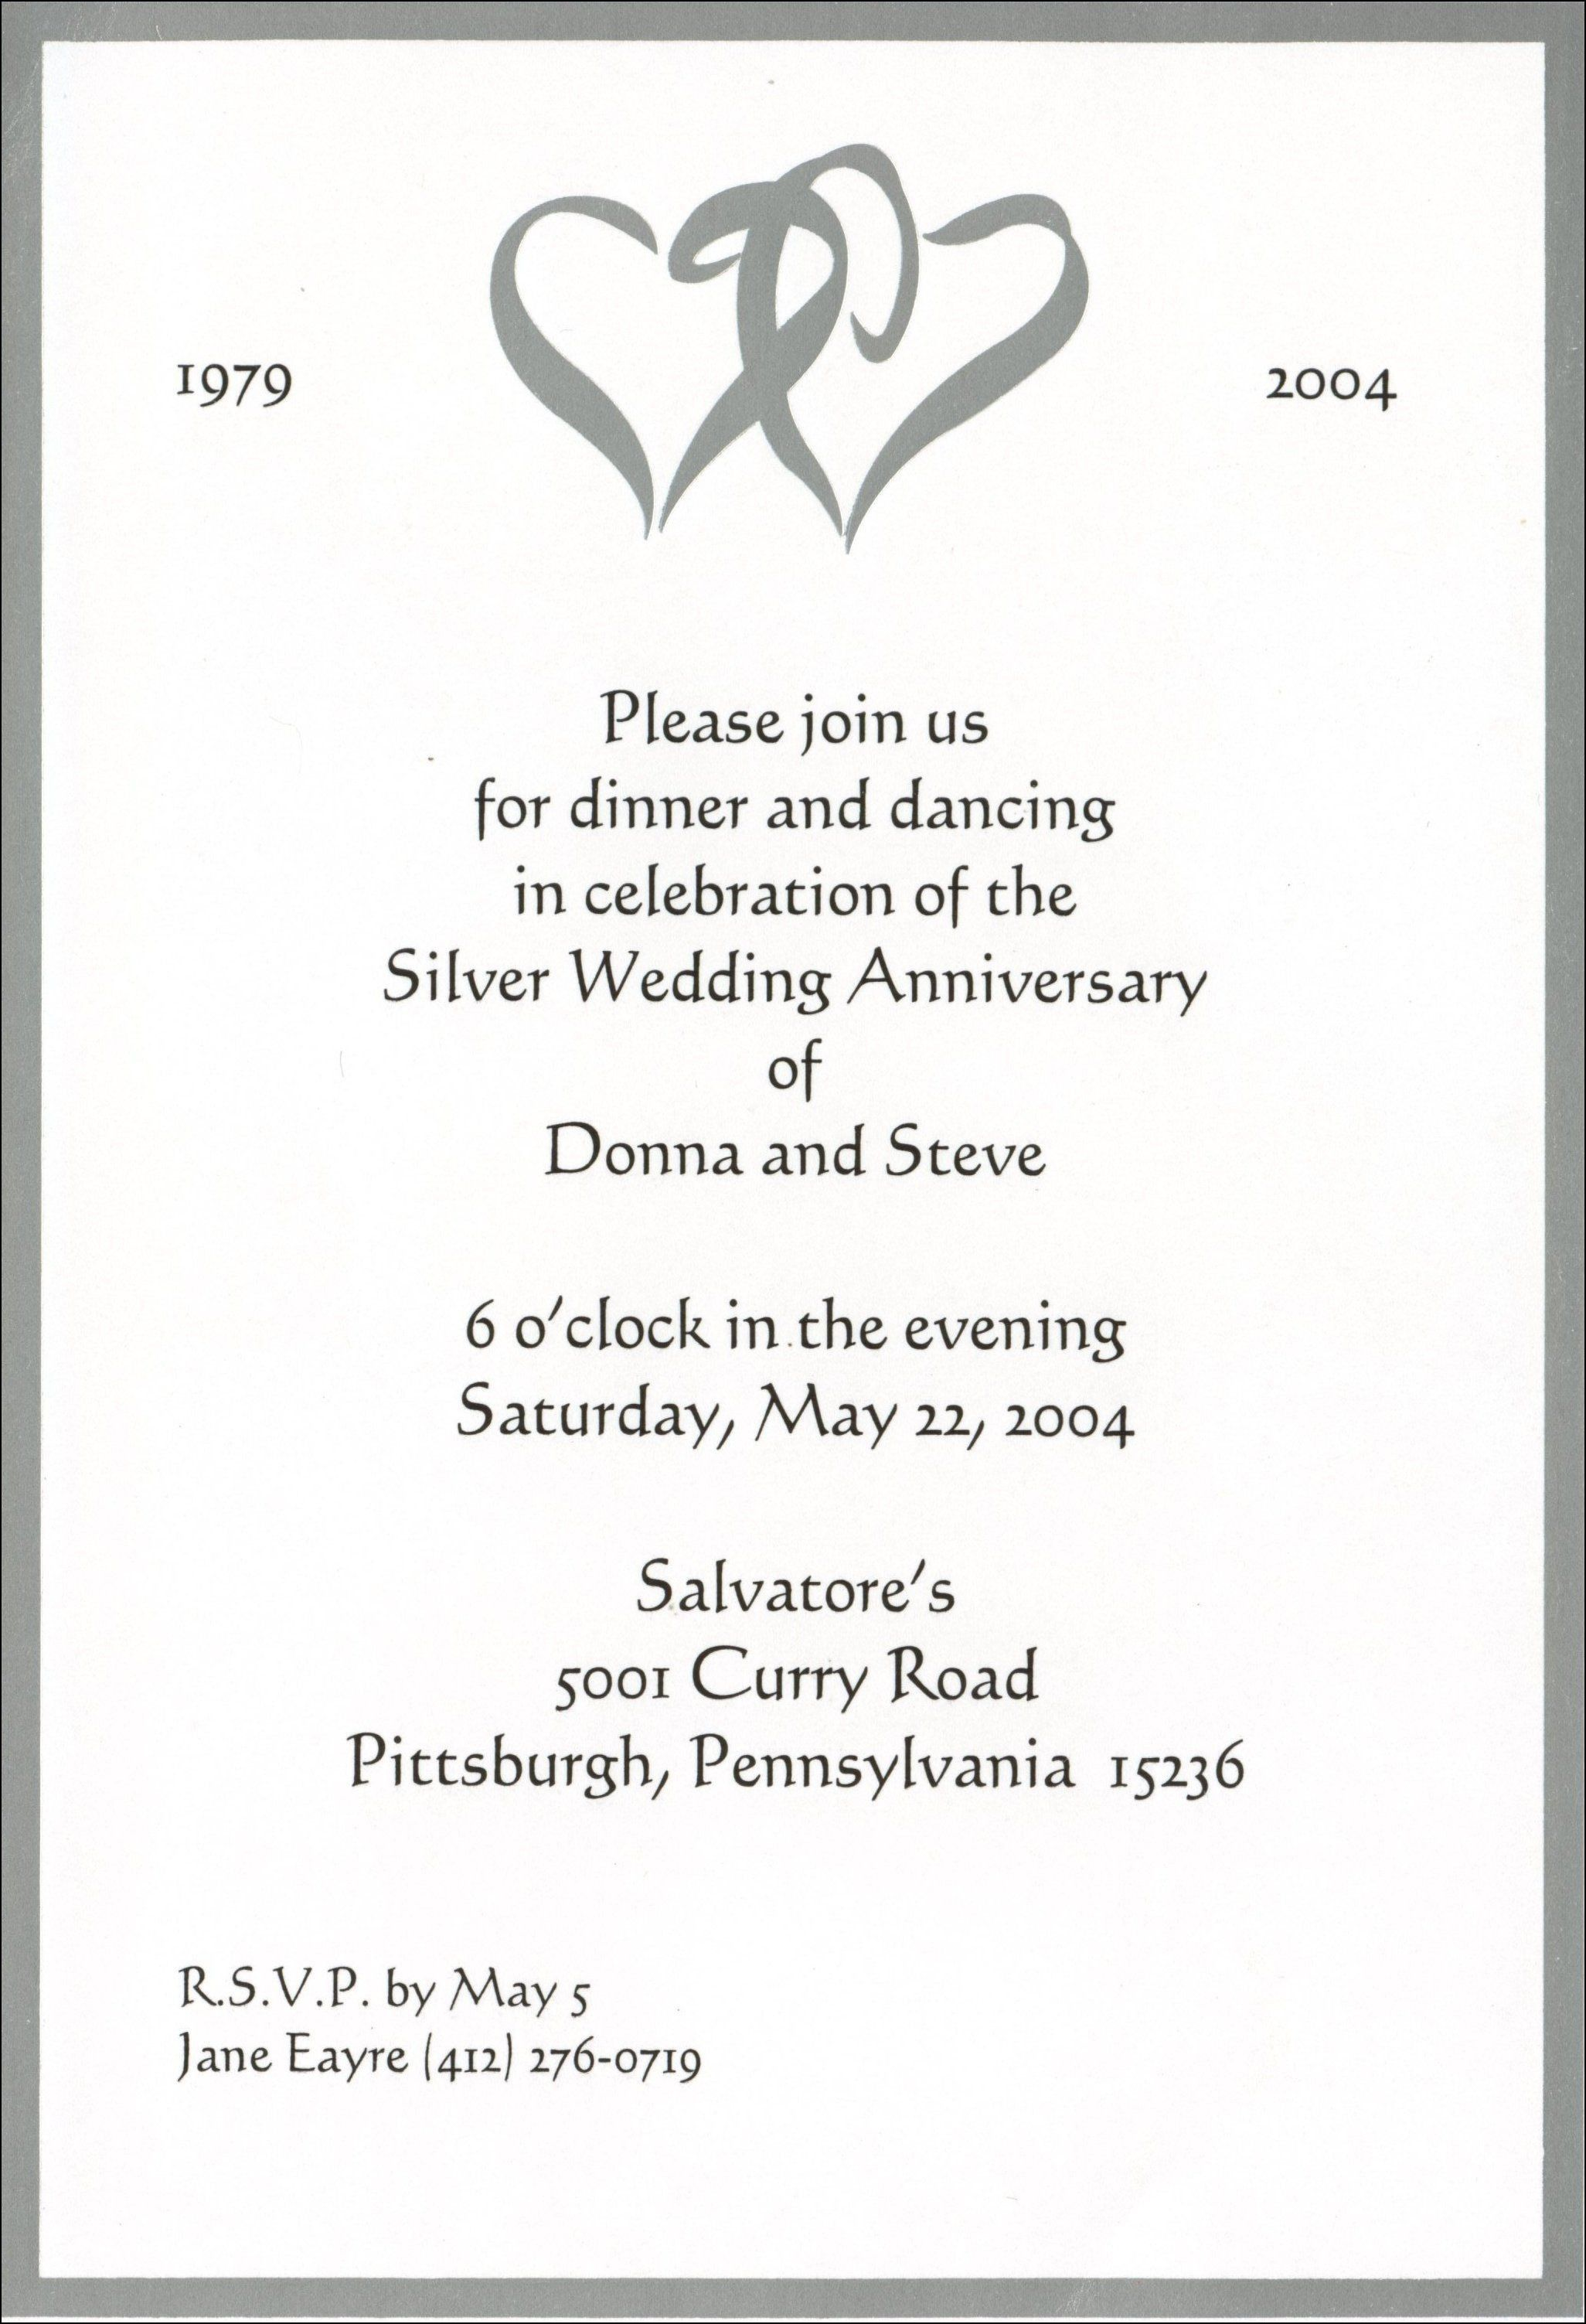 007 Shocking 50th Wedding Anniversary Invitation Template Free Download Image  GoldenFull